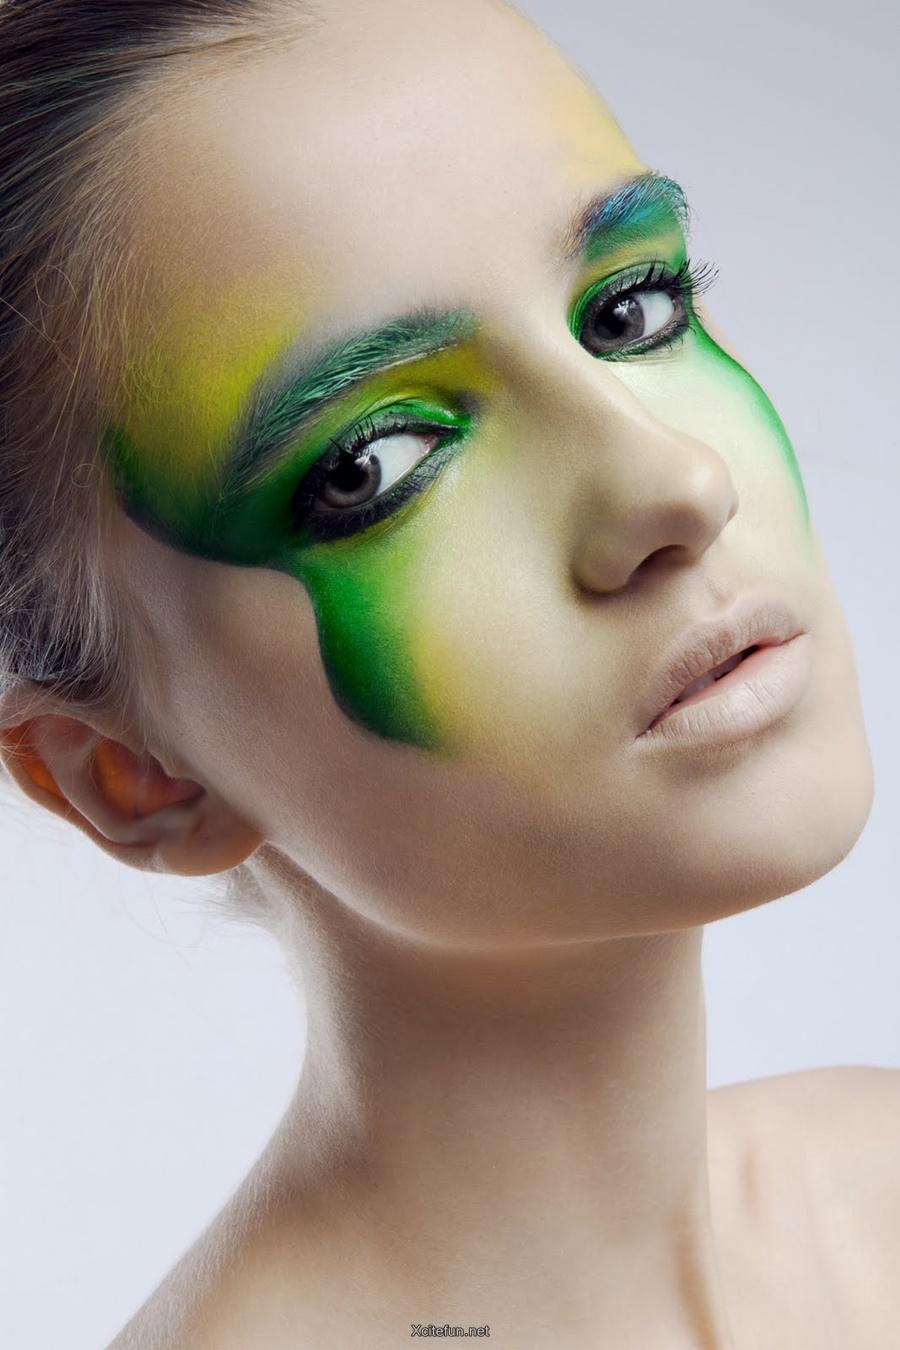 Green Smokey And Shimmery Eye Makeup - XciteFun.net